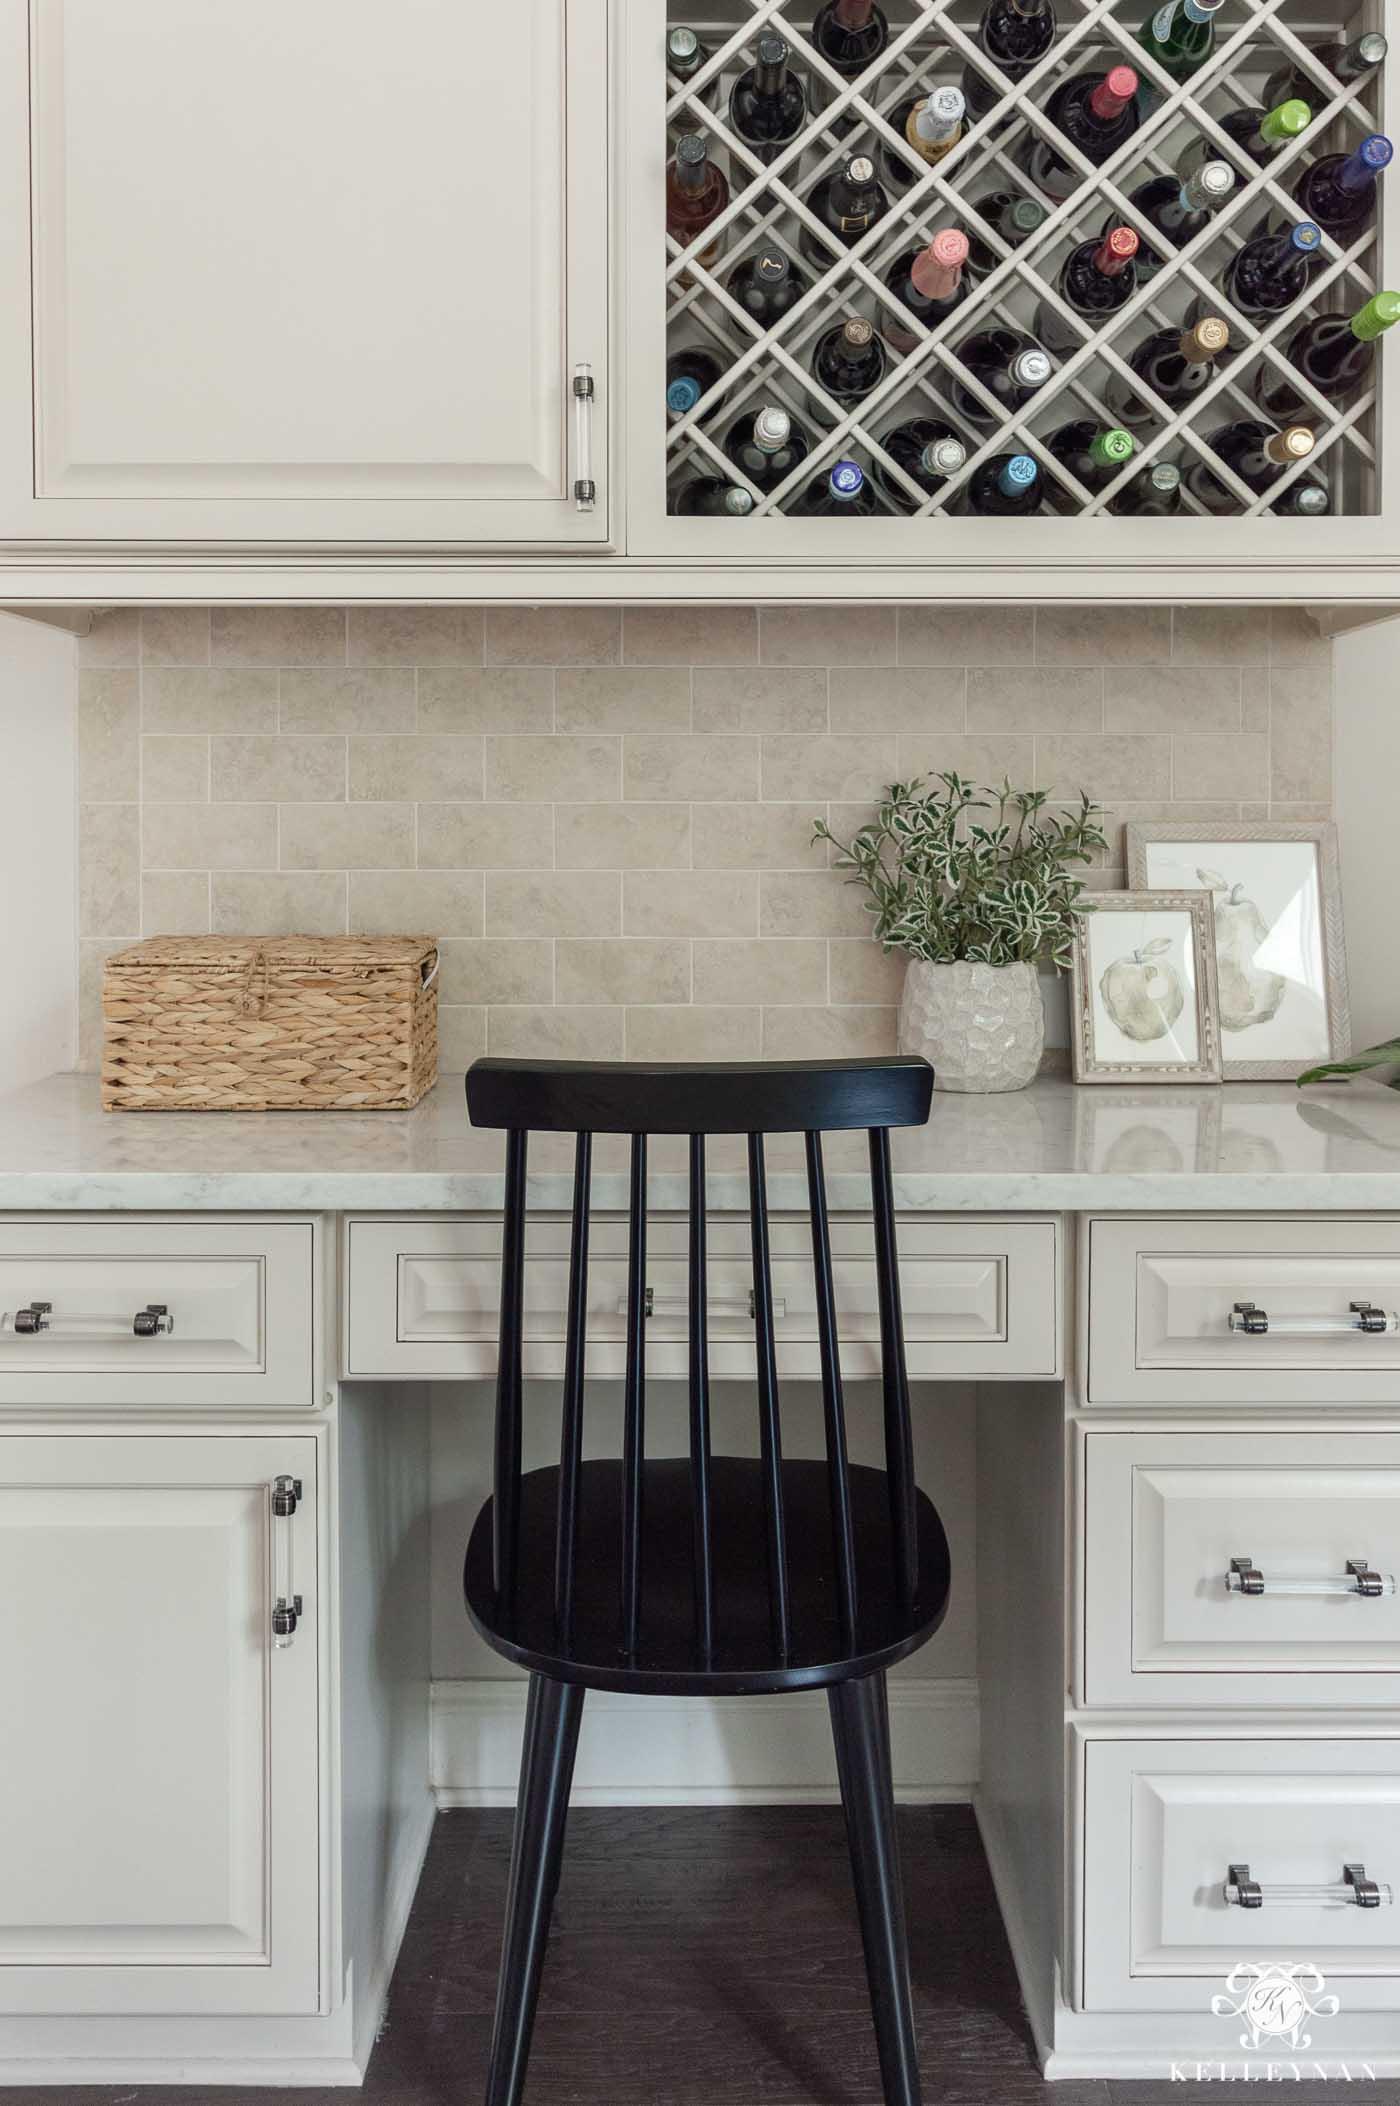 Kitchen Stationery Desk Area Inspiration and Decor Ideas